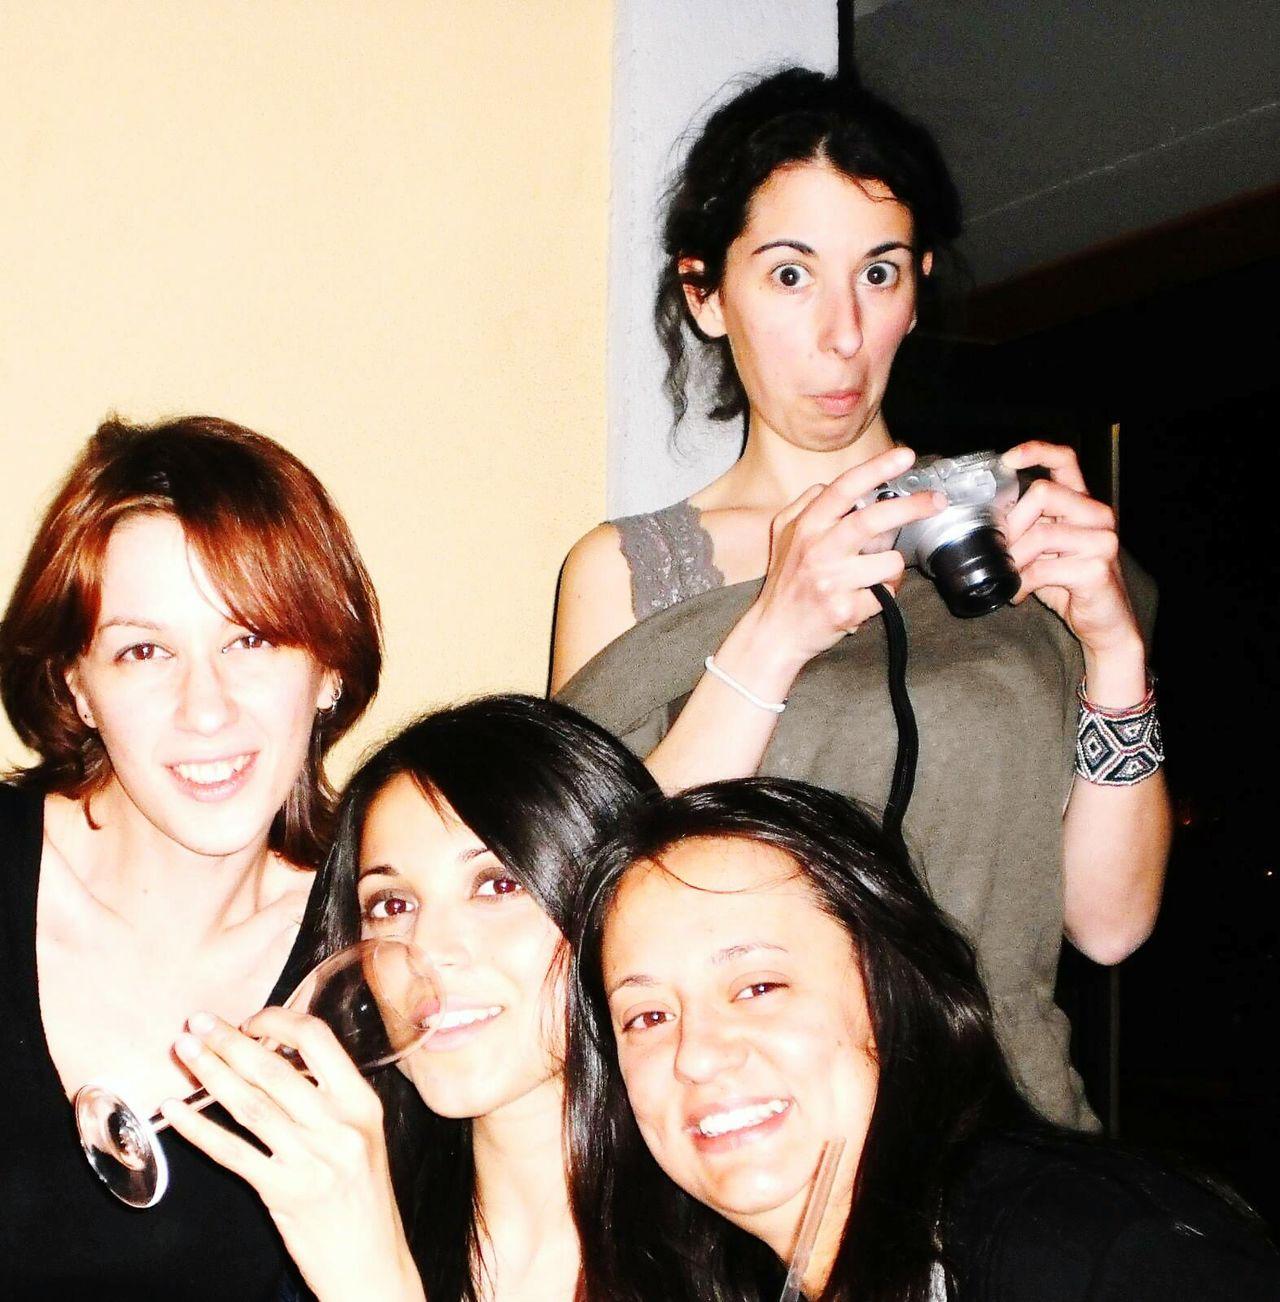 Group Photo Womens Portraiture Donne Togetherness Femminilità Femininity Drunken Brille